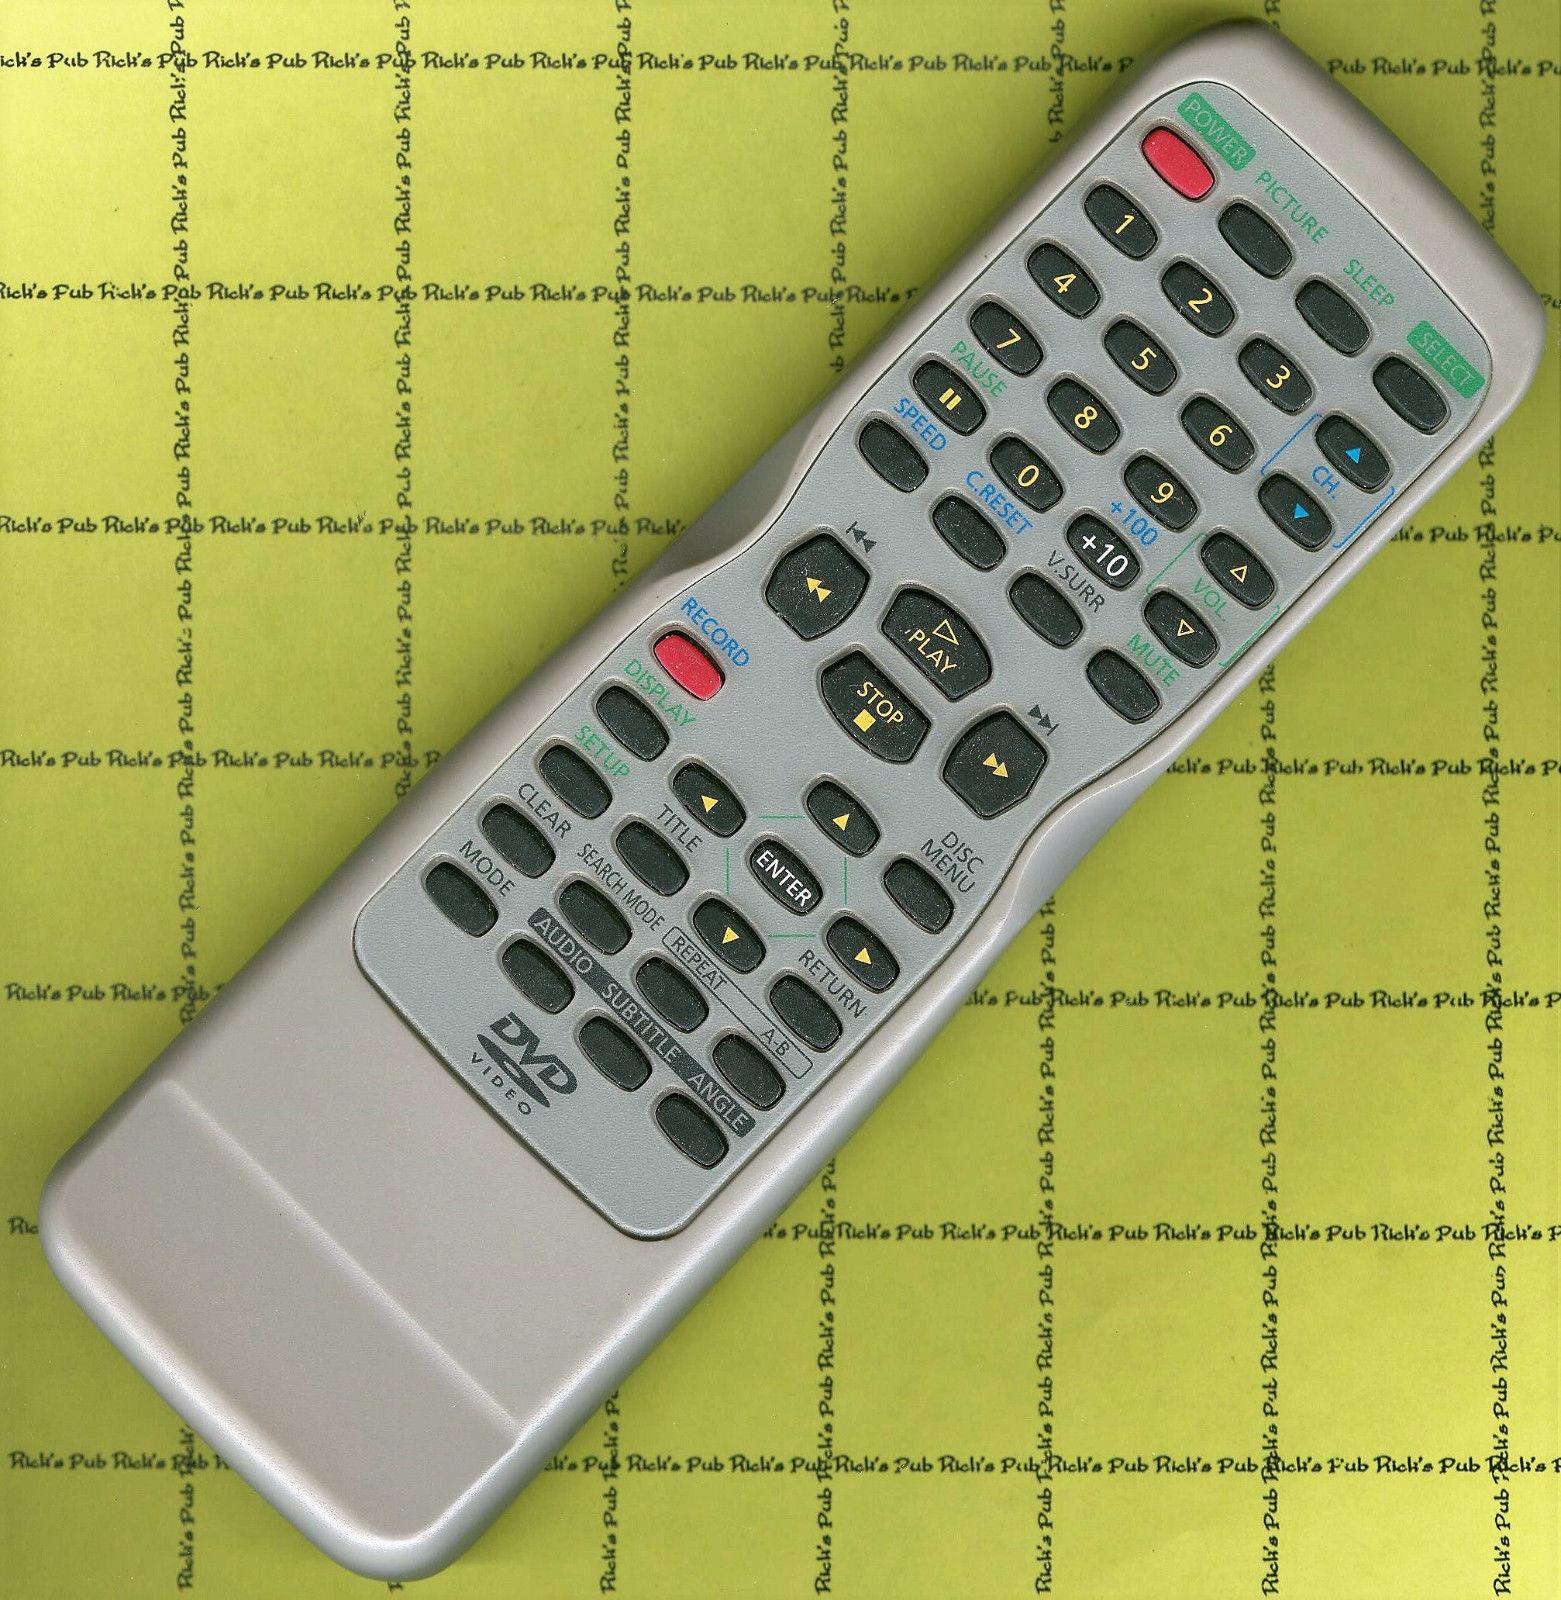 repair manual sylvania 6727dd color television dvd vcr